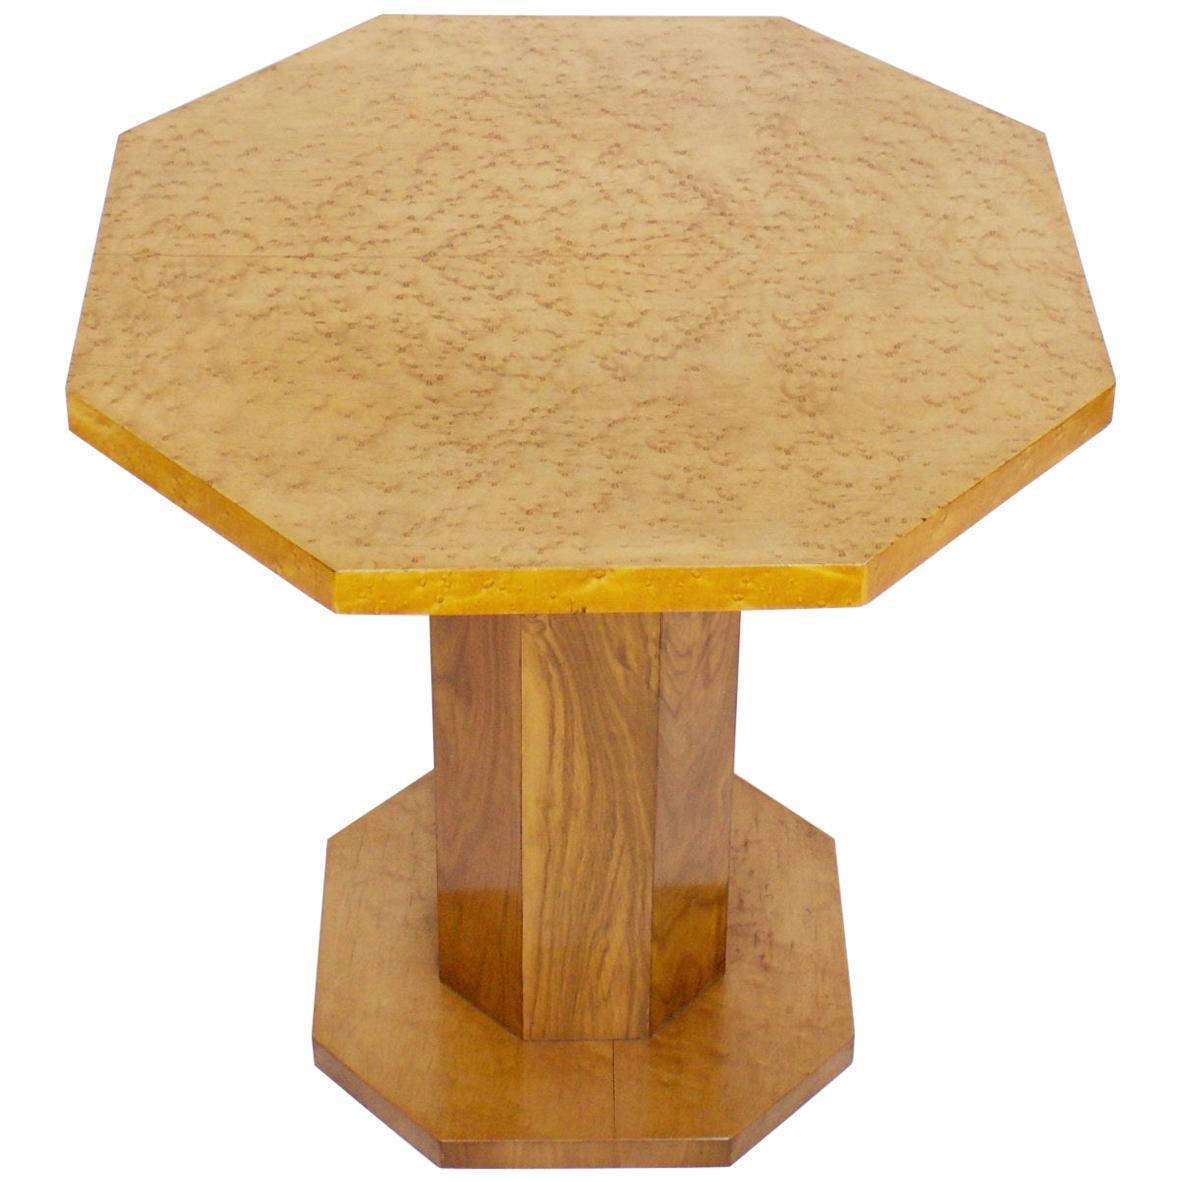 Art Deco Side Table with Birdseye Maple and Burr Walnut Veneers